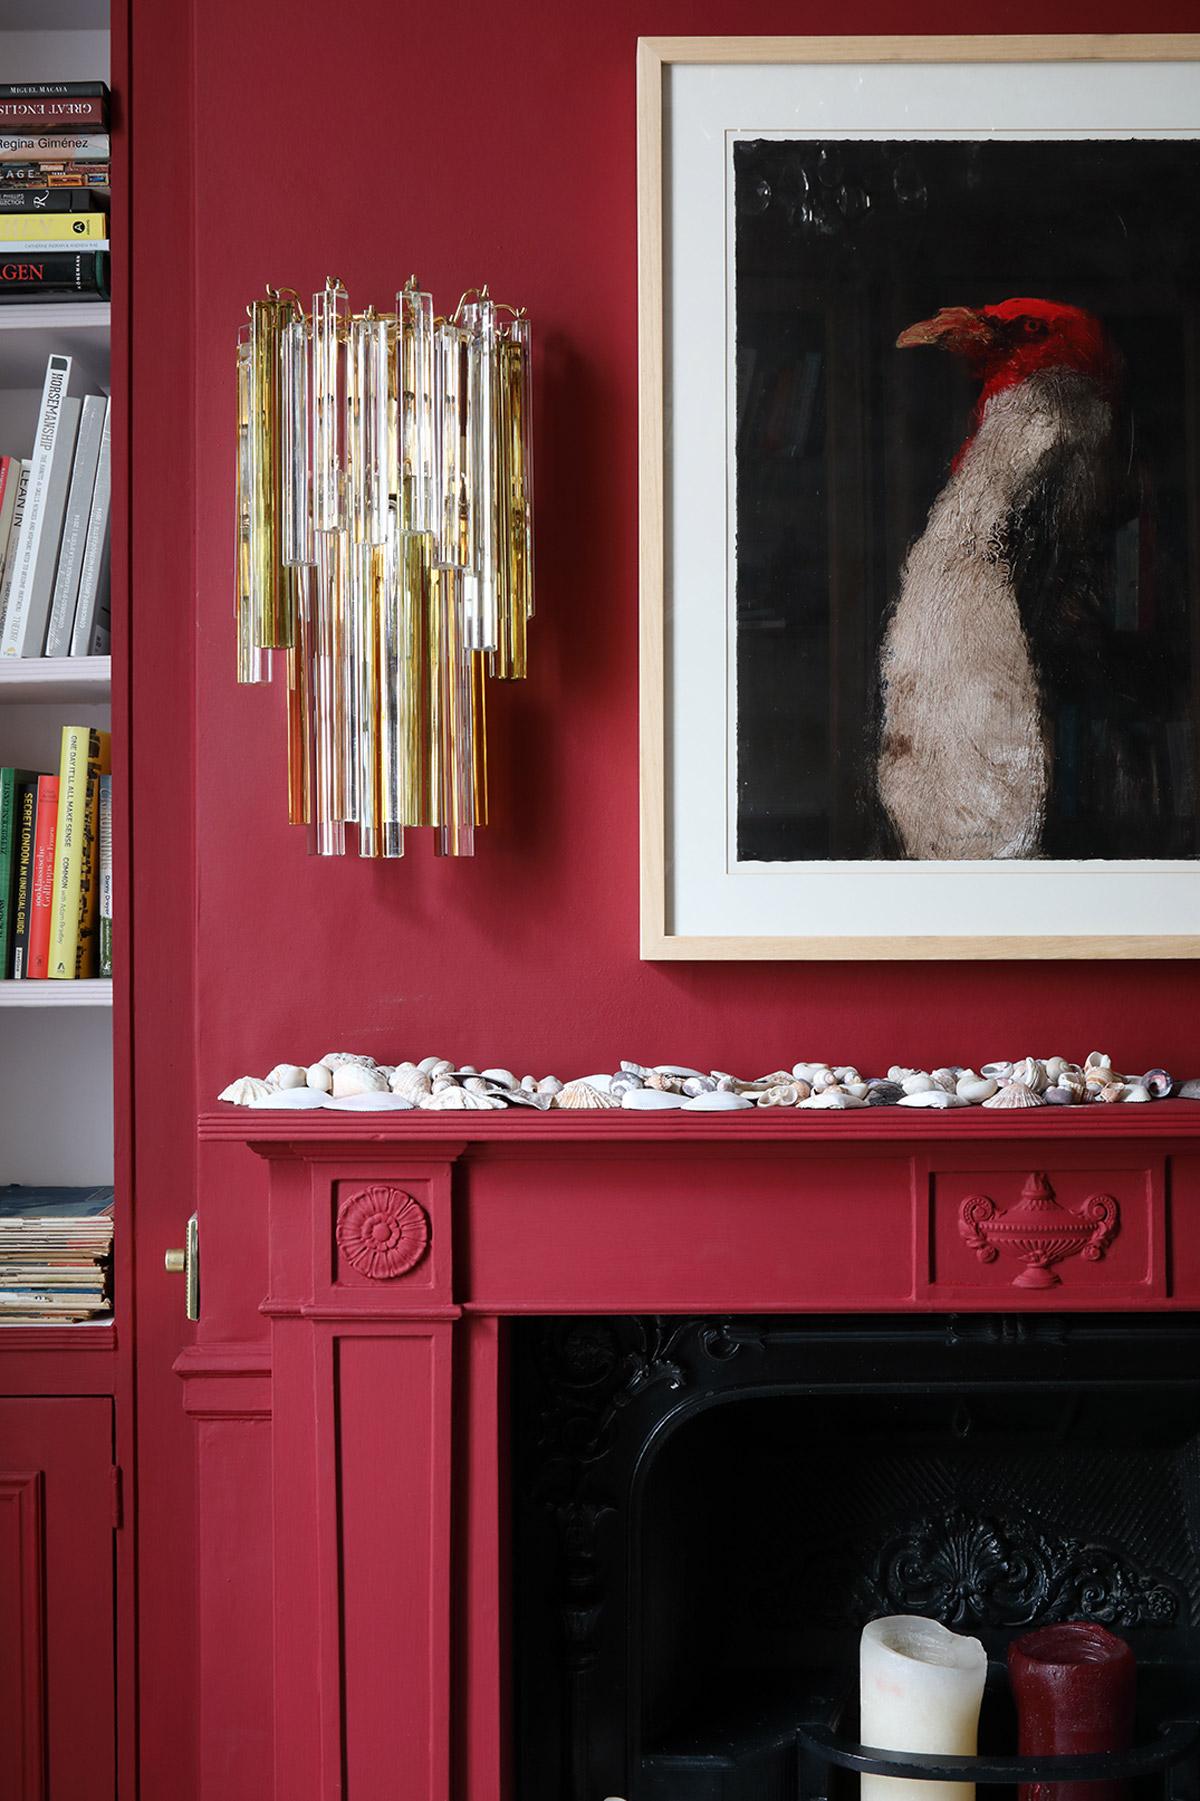 Interior designer, Ana Engelhorn project image of fireplace